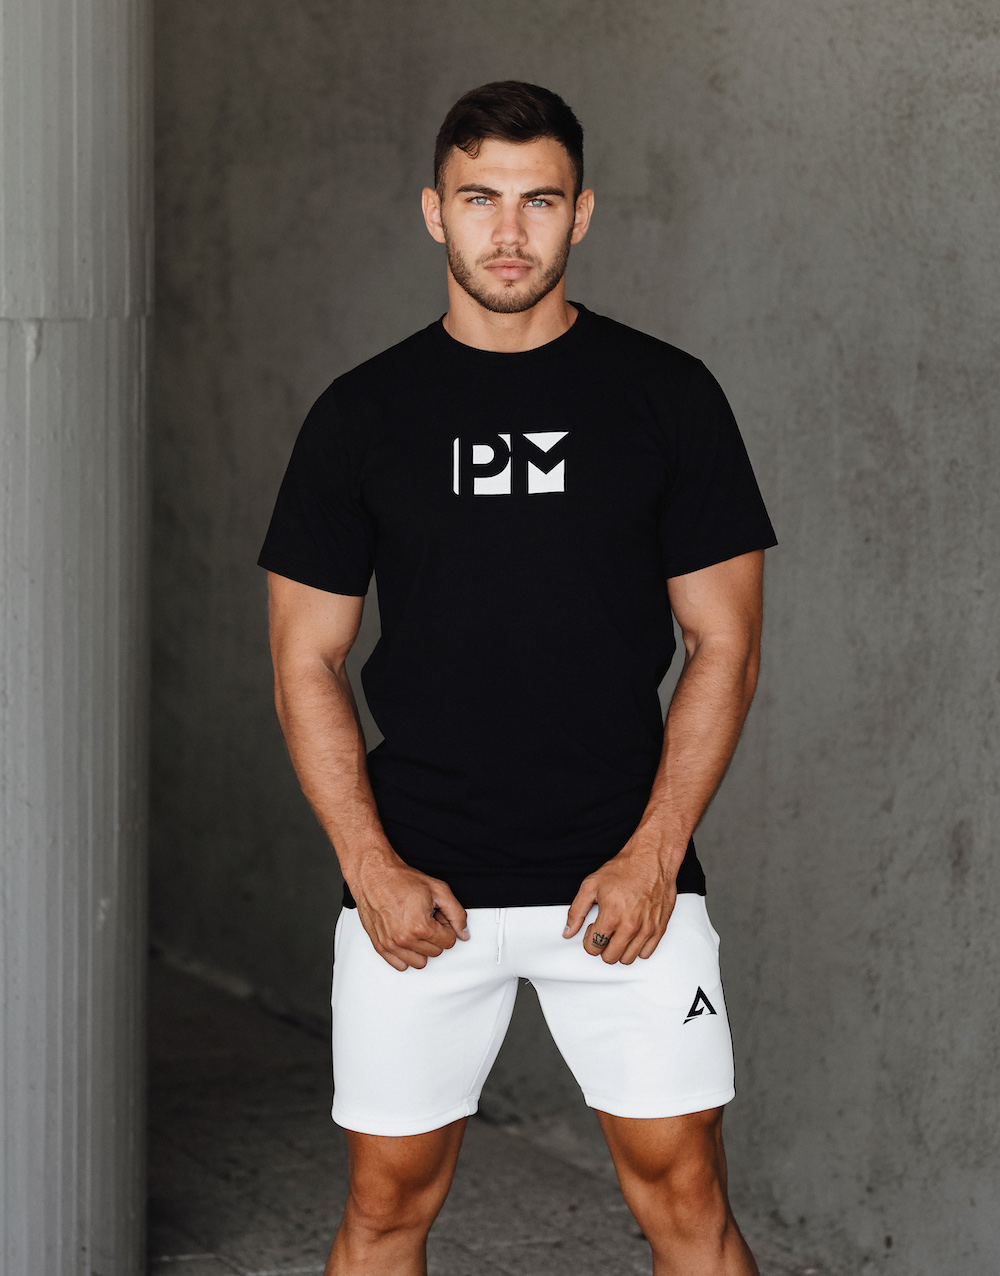 PM Classic T-shirt v5